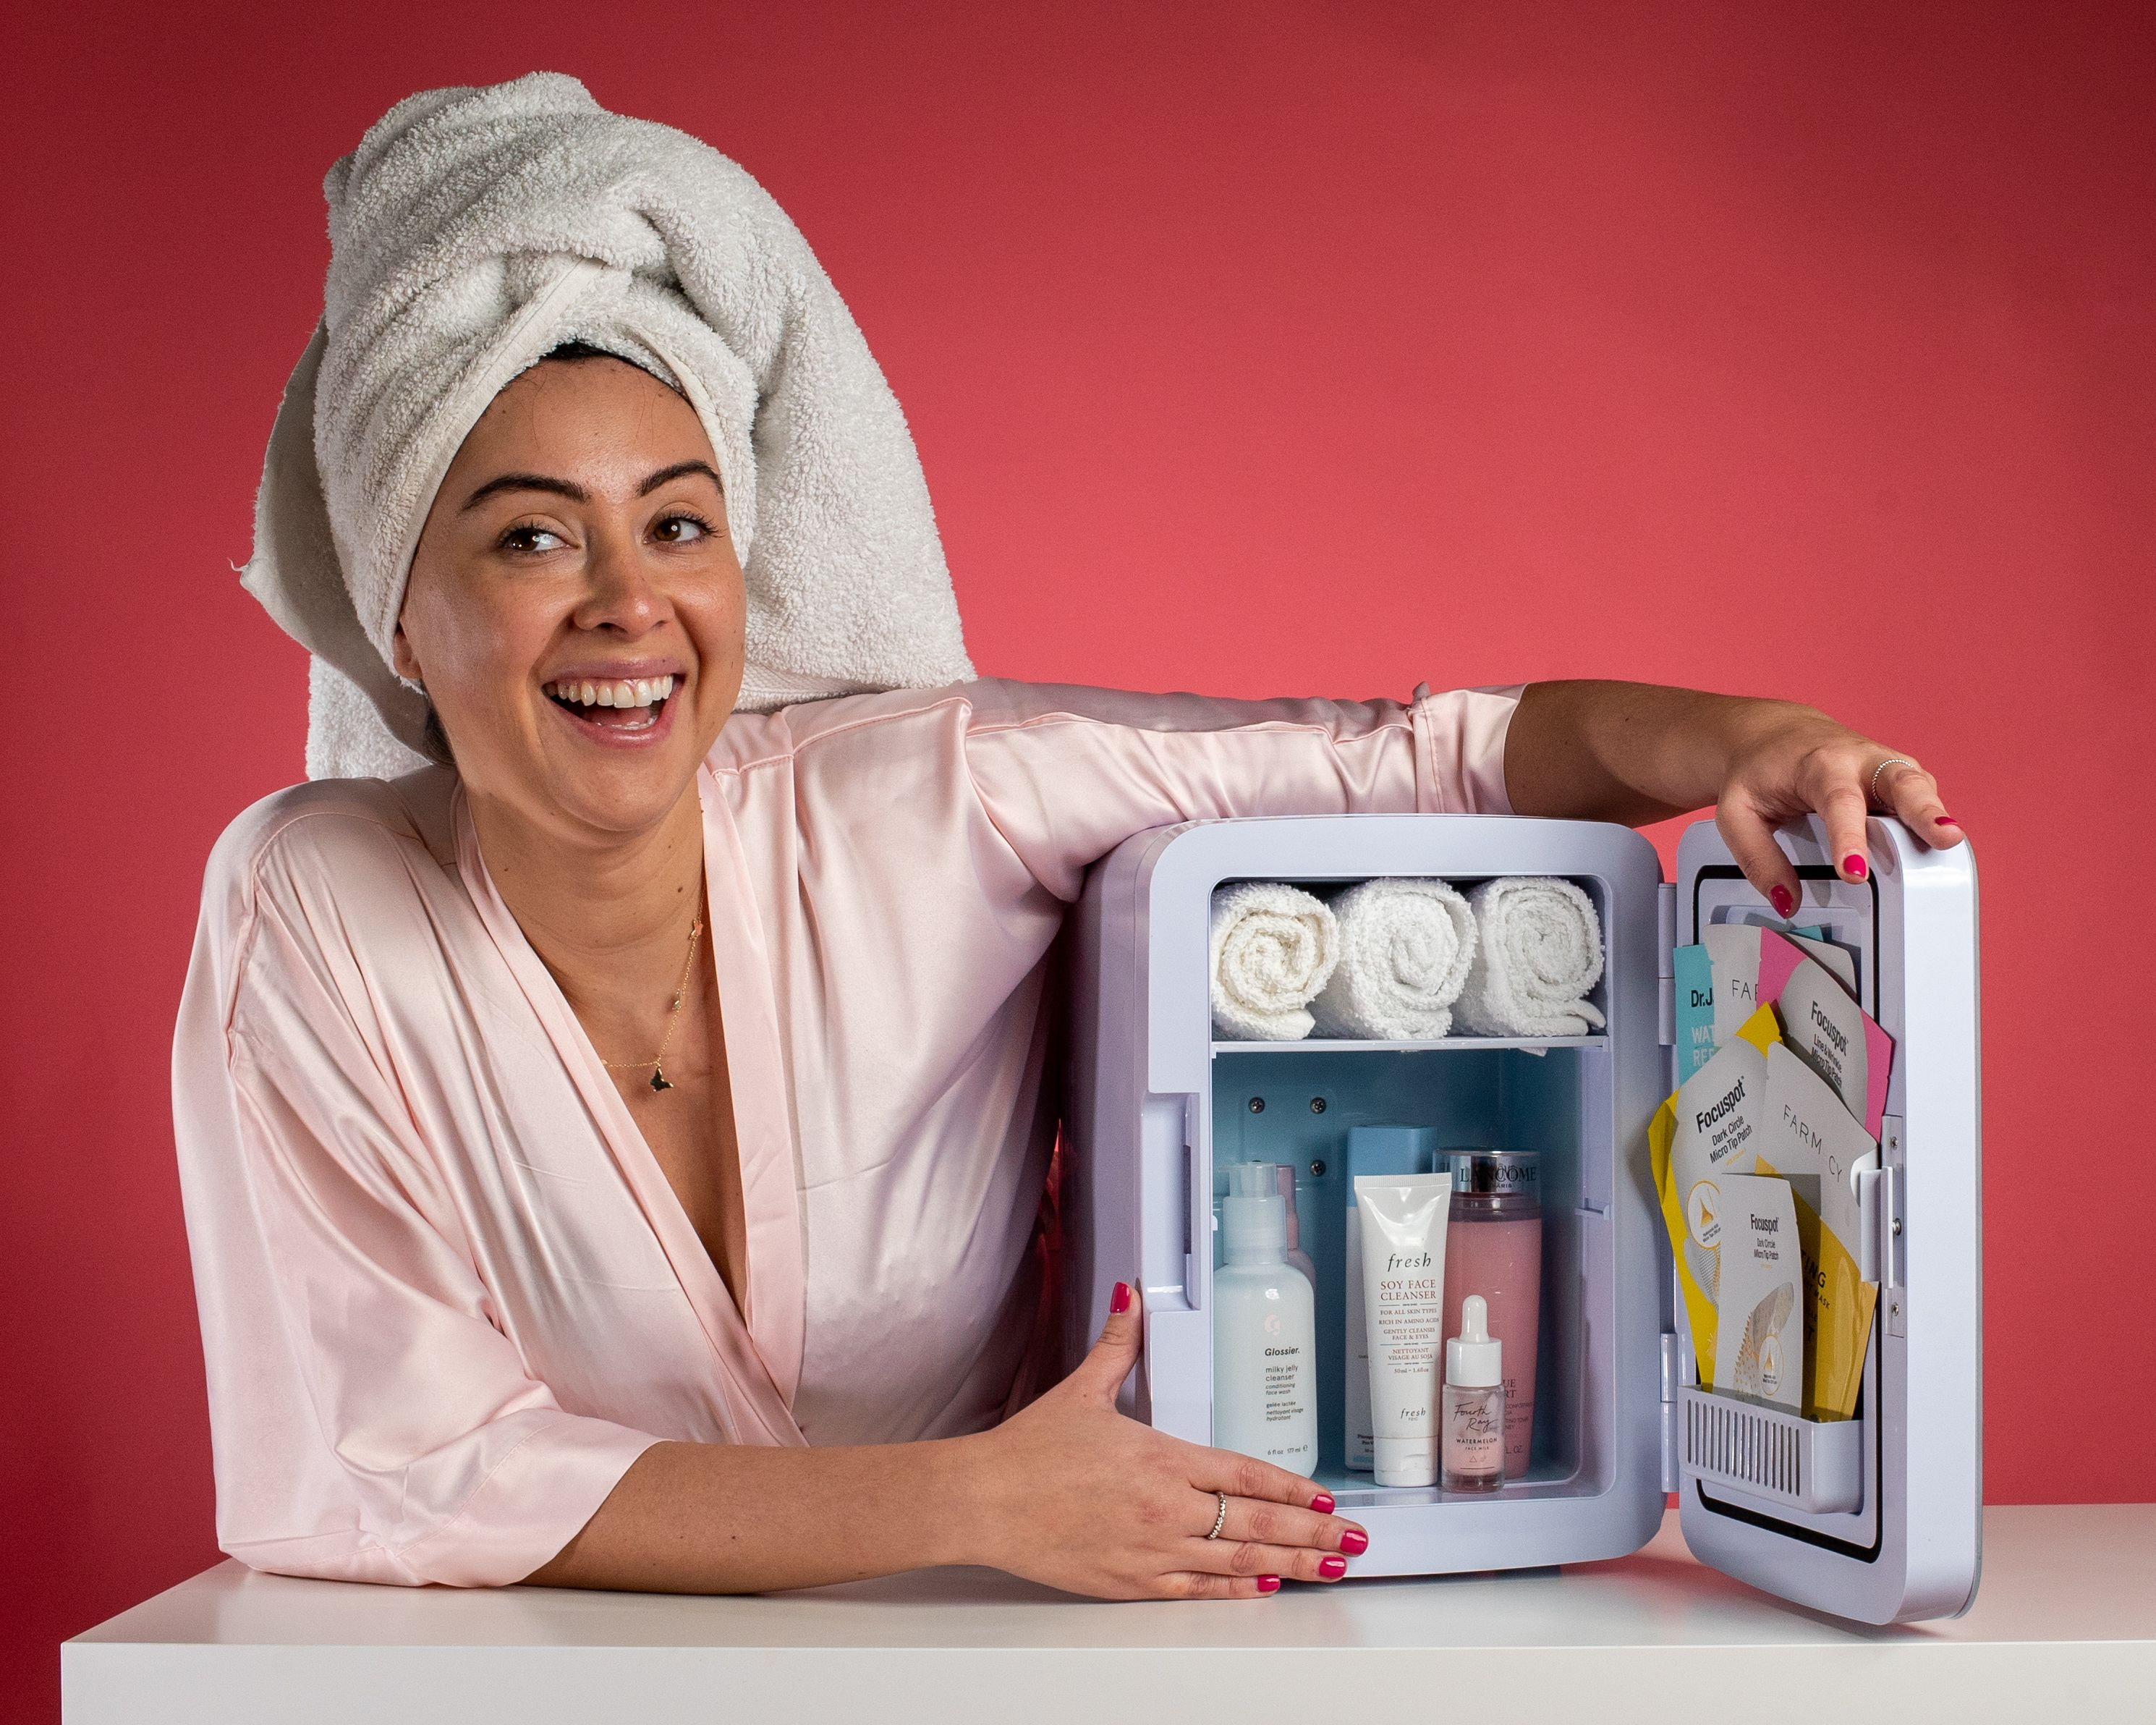 Skincare Makeup Beauty Fridge in 2020 Skin care, Beauty